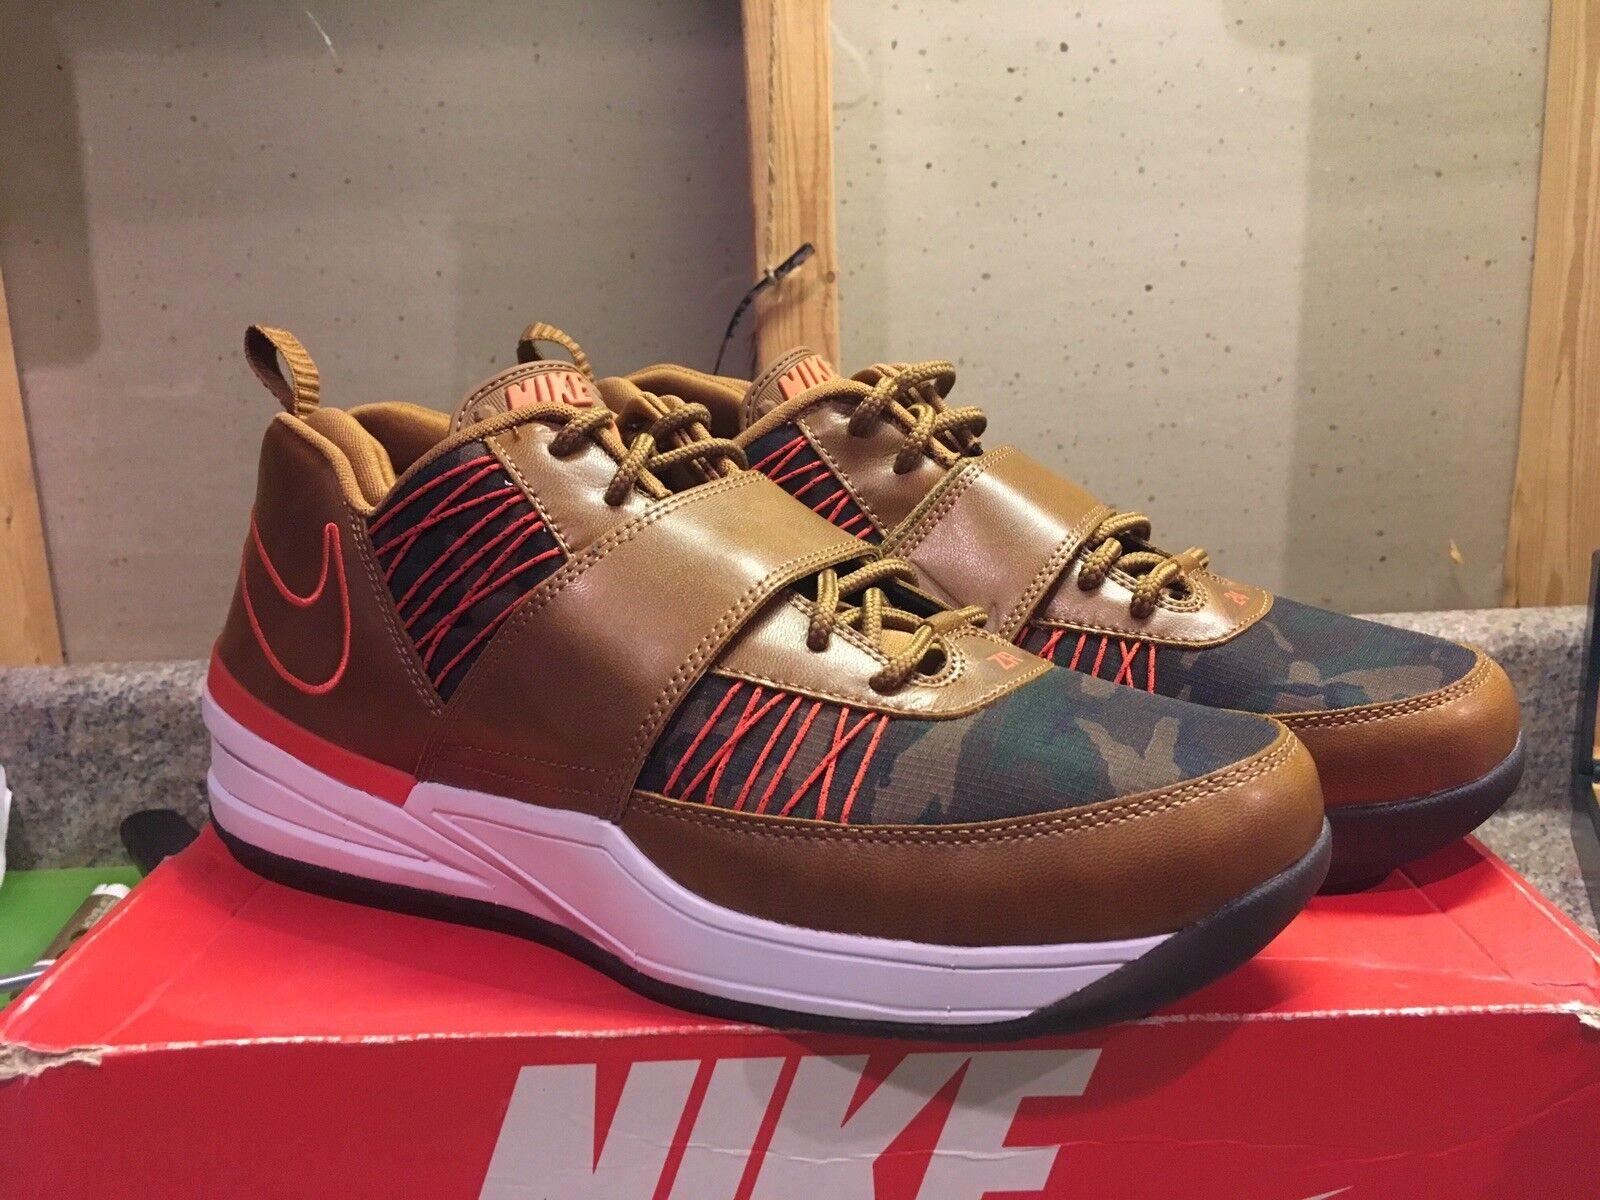 Nike Zoom Revis TXT EXT Camouflage Cheap women's shoes women's shoes